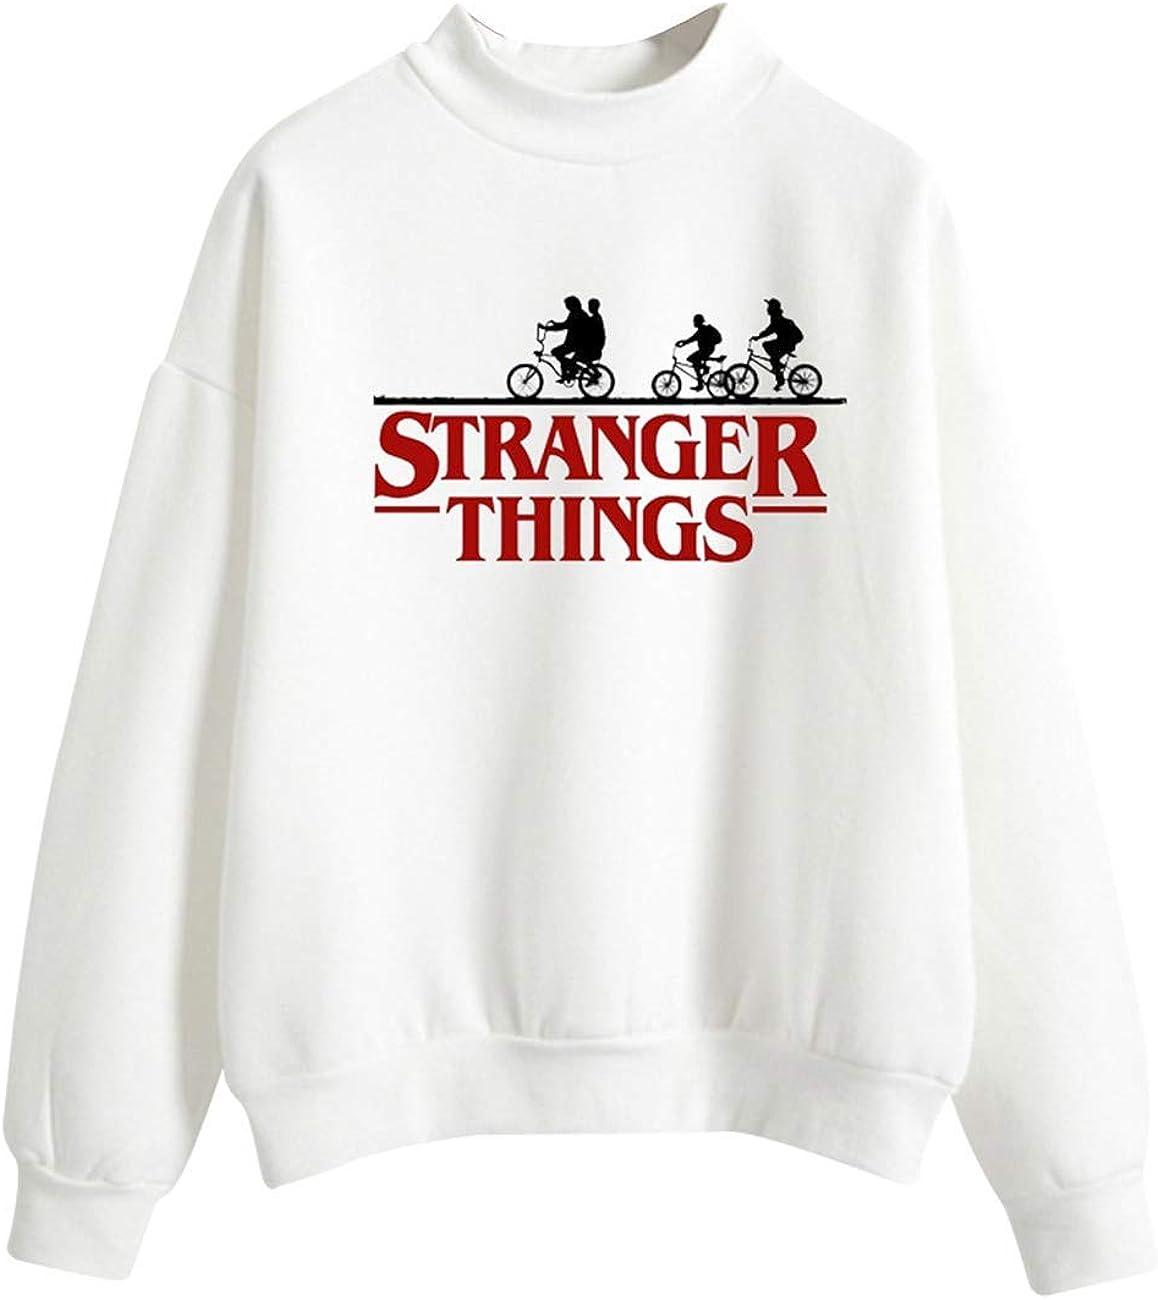 Sudadera Stranger Things Ni/ña Sudadera Stranger Things Cuello Alto Manga Larga Letra Eleven Impresi/ón Sudaderas sin Capucha Su/éter